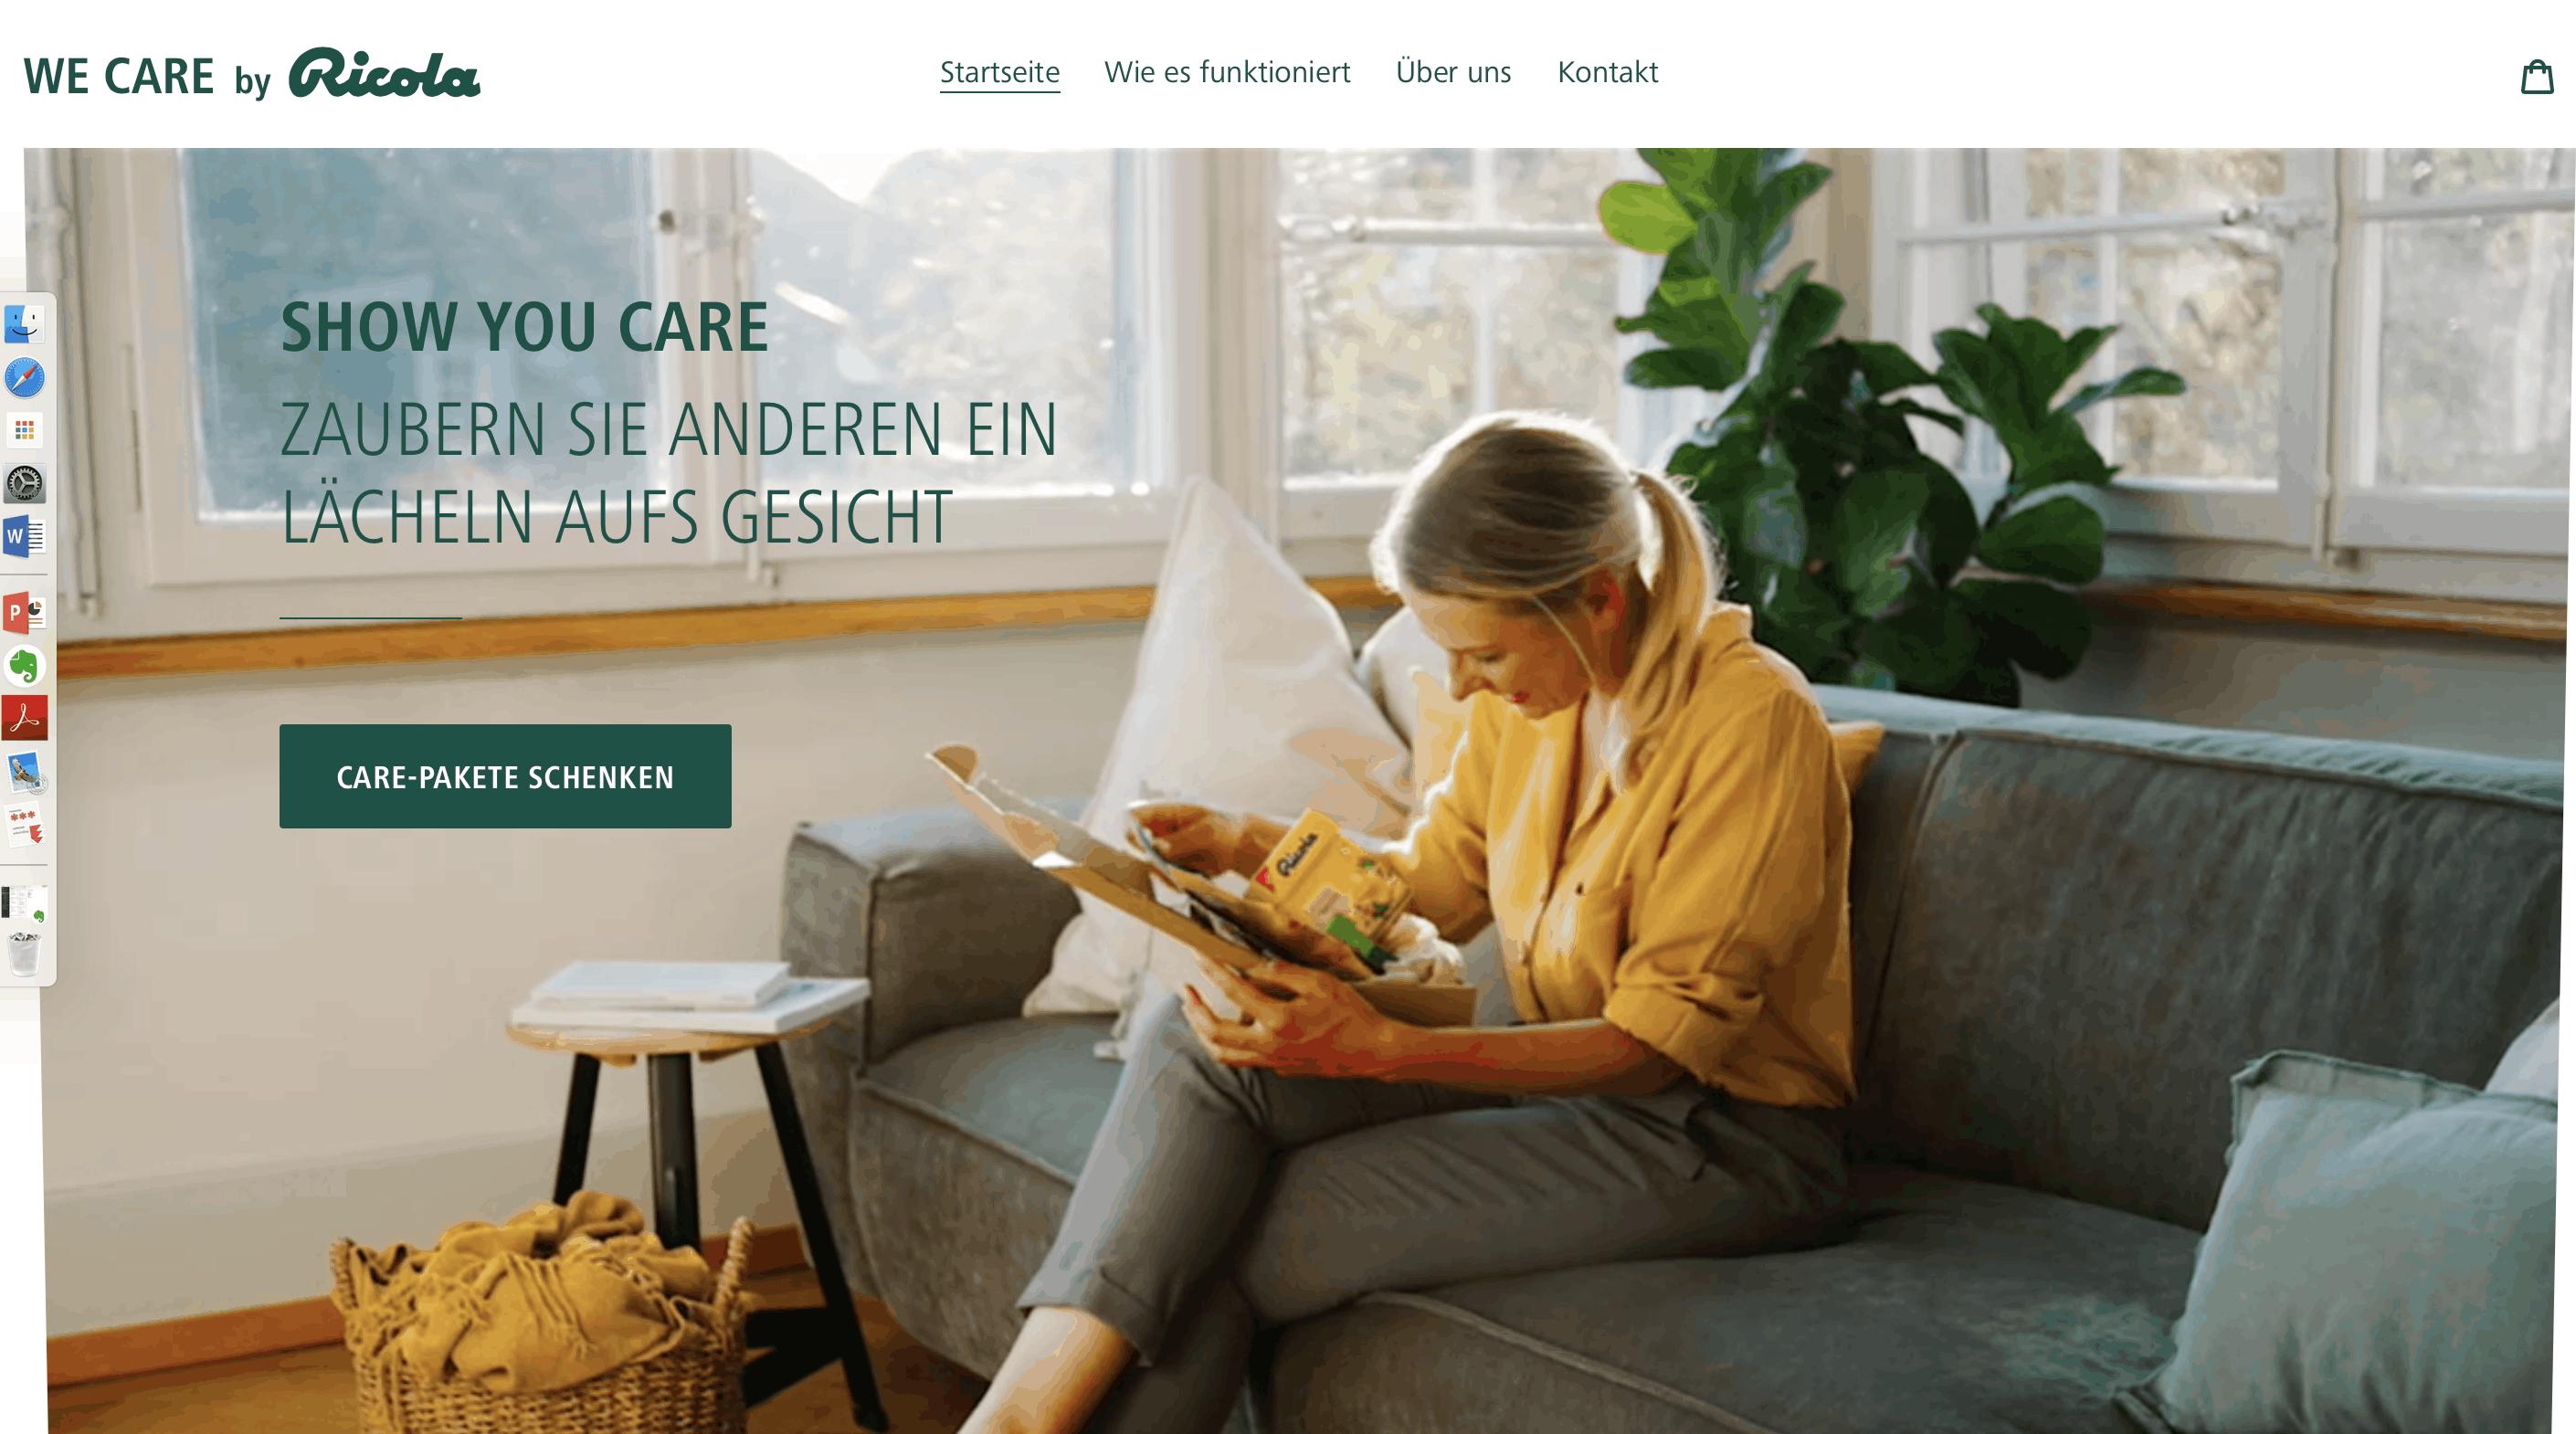 we care ricola |Screenshot